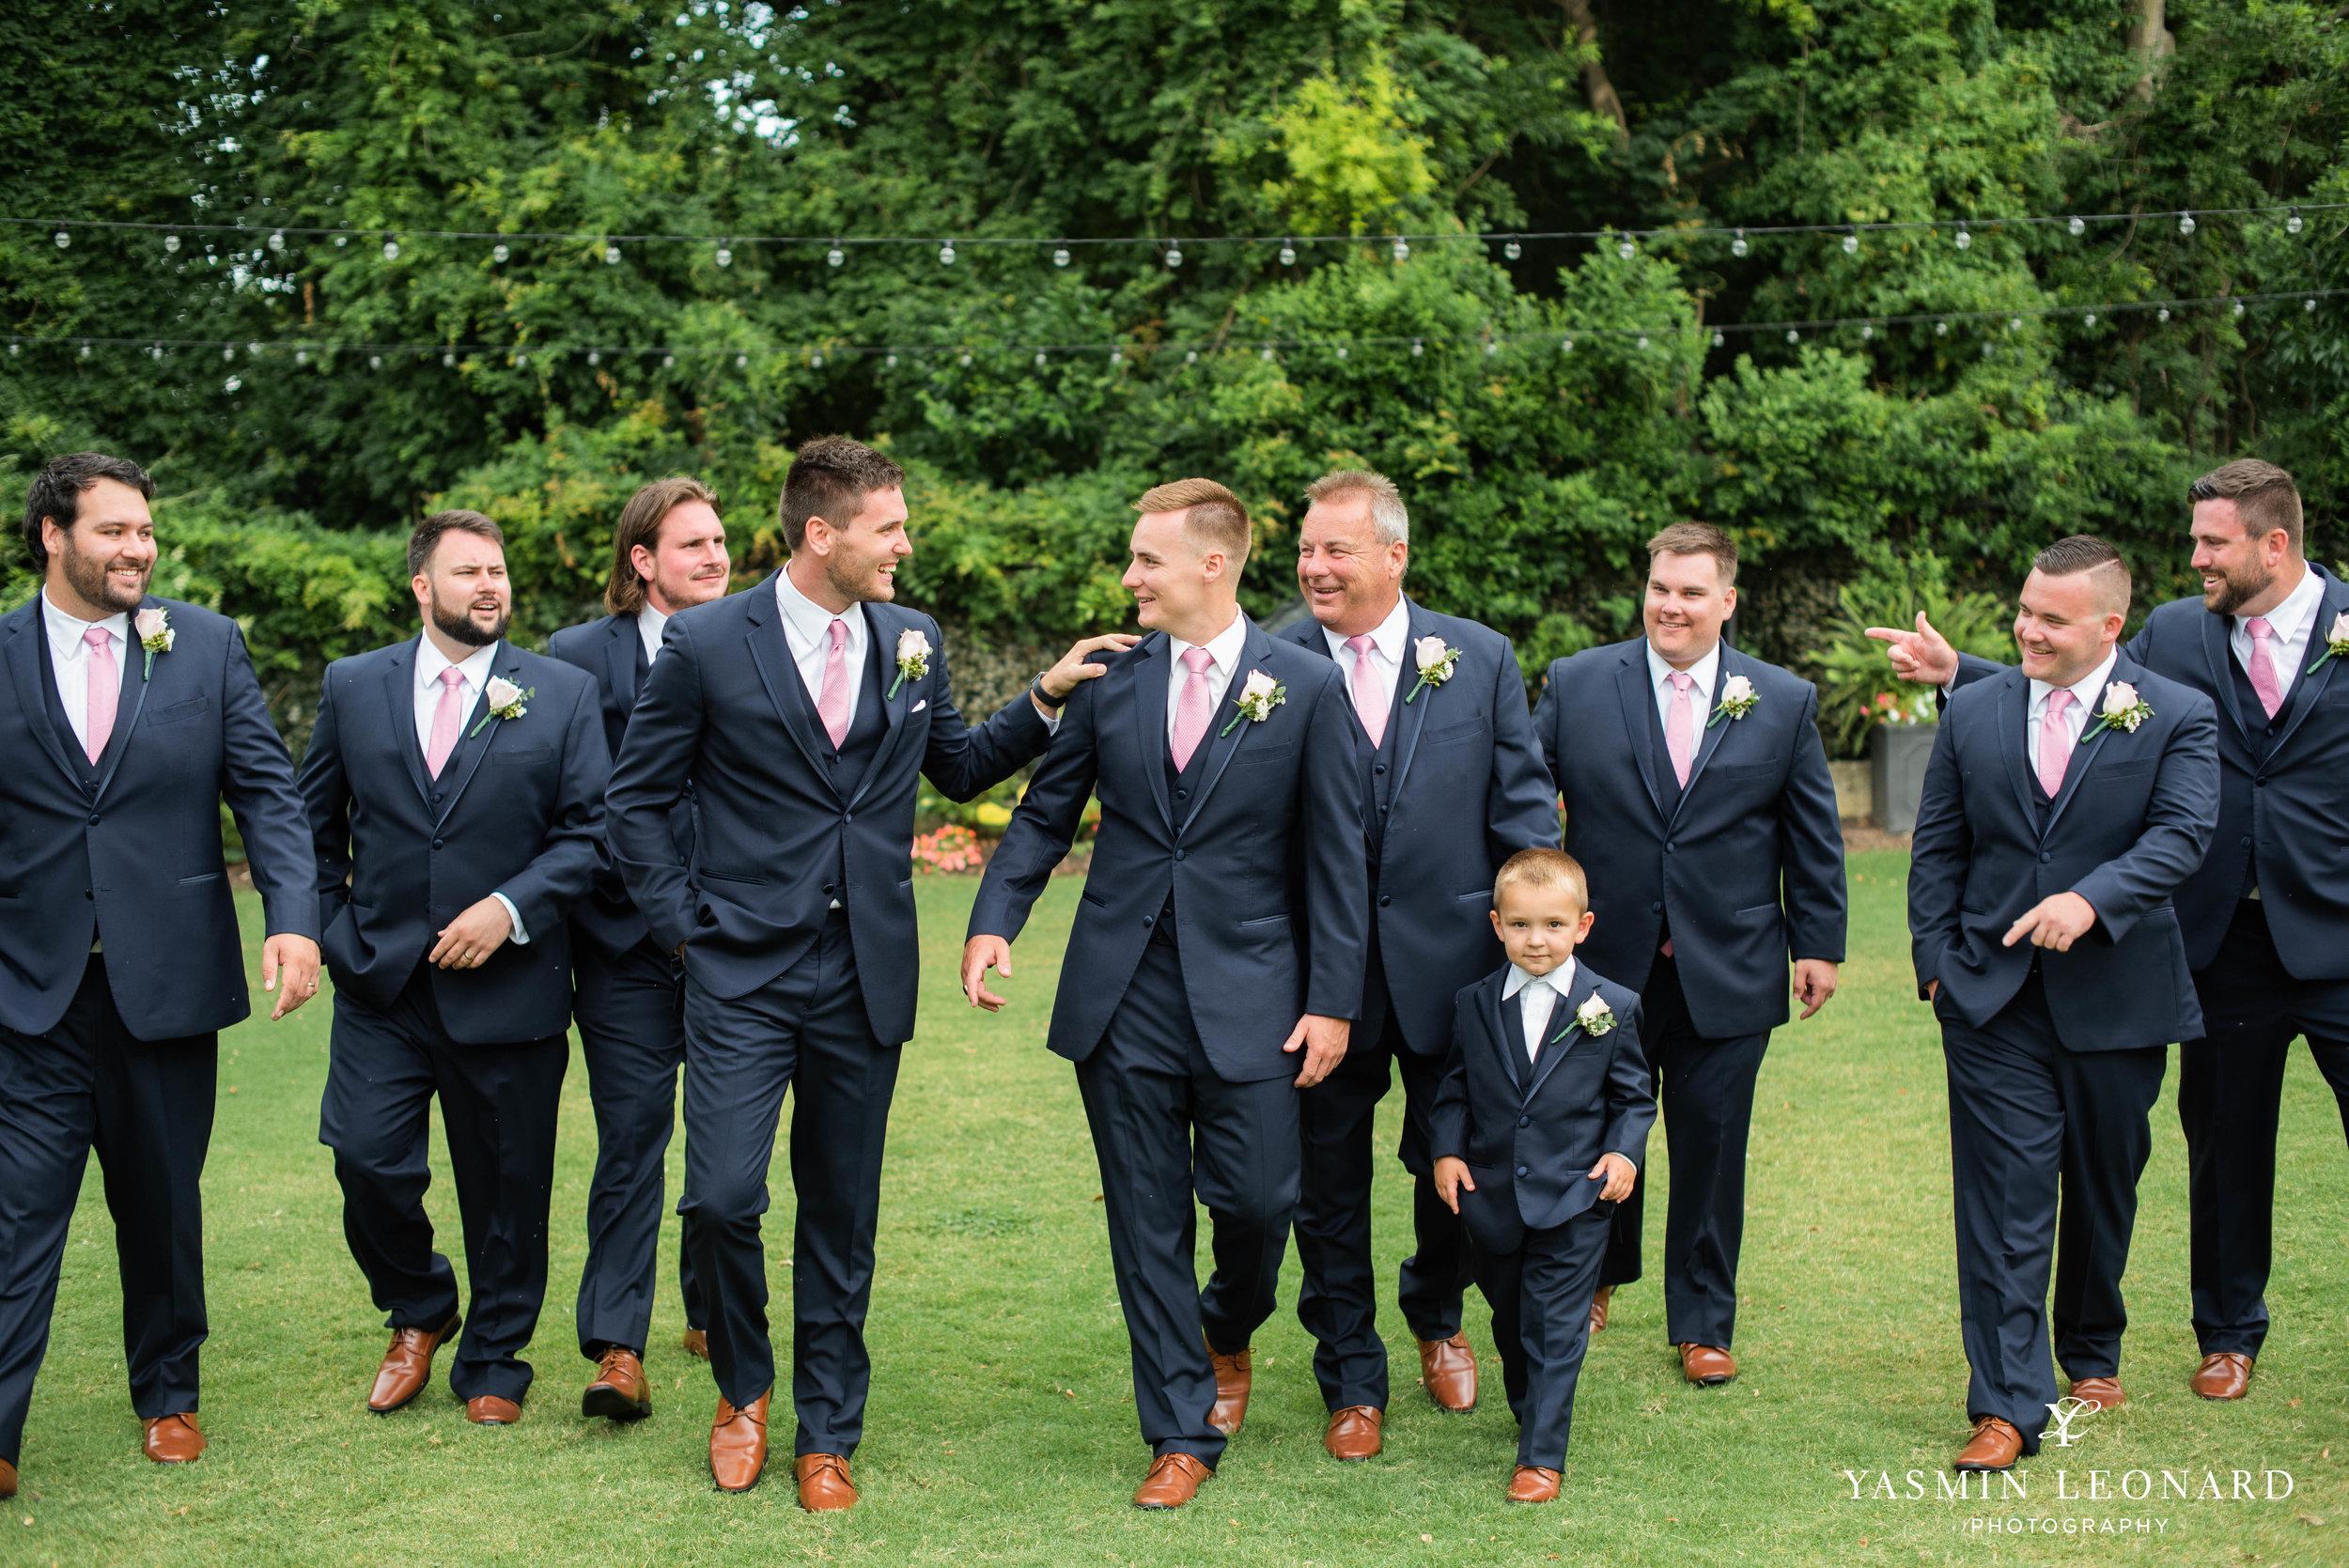 Separk Mansion - NC Weddings - Gastonia Wedding - NC Wedding Venues - Pink and Blue Wedding Ideas - Pink Bridesmaid Dresses - Yasmin Leonard Photography-15.jpg